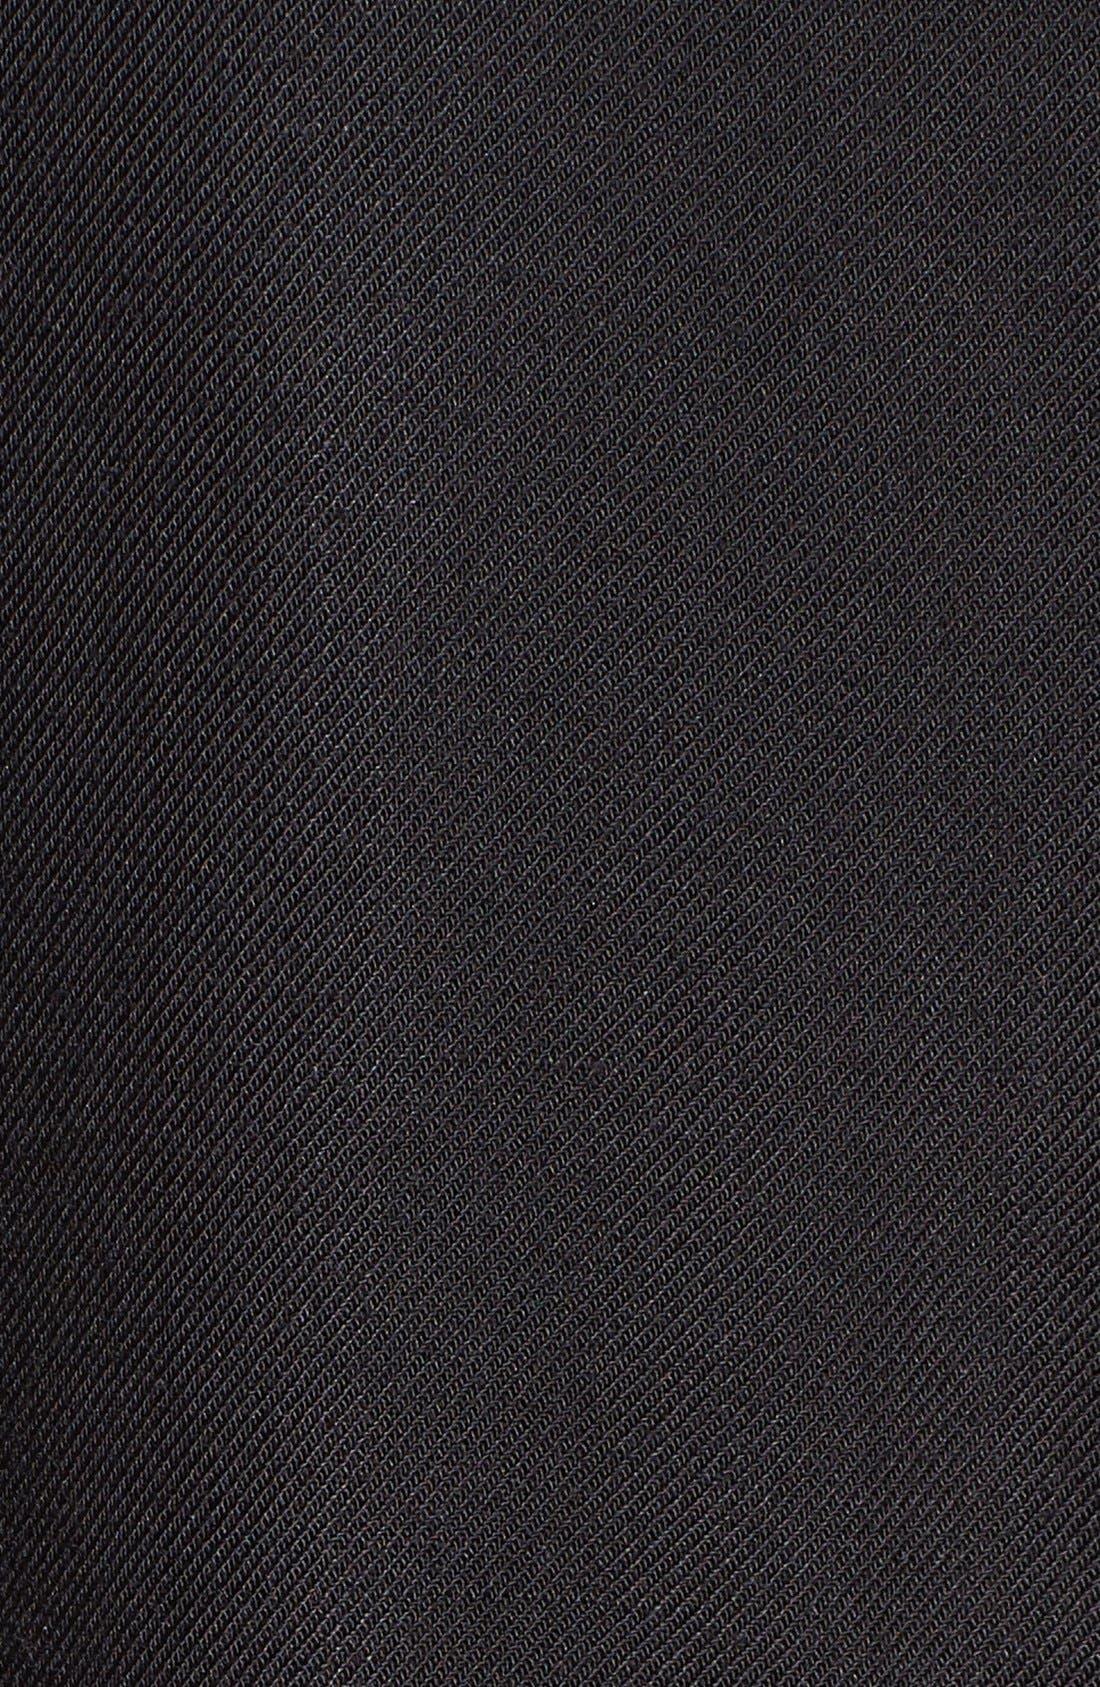 Alternate Image 5  - PAIGE 'Everleigh' Shirt